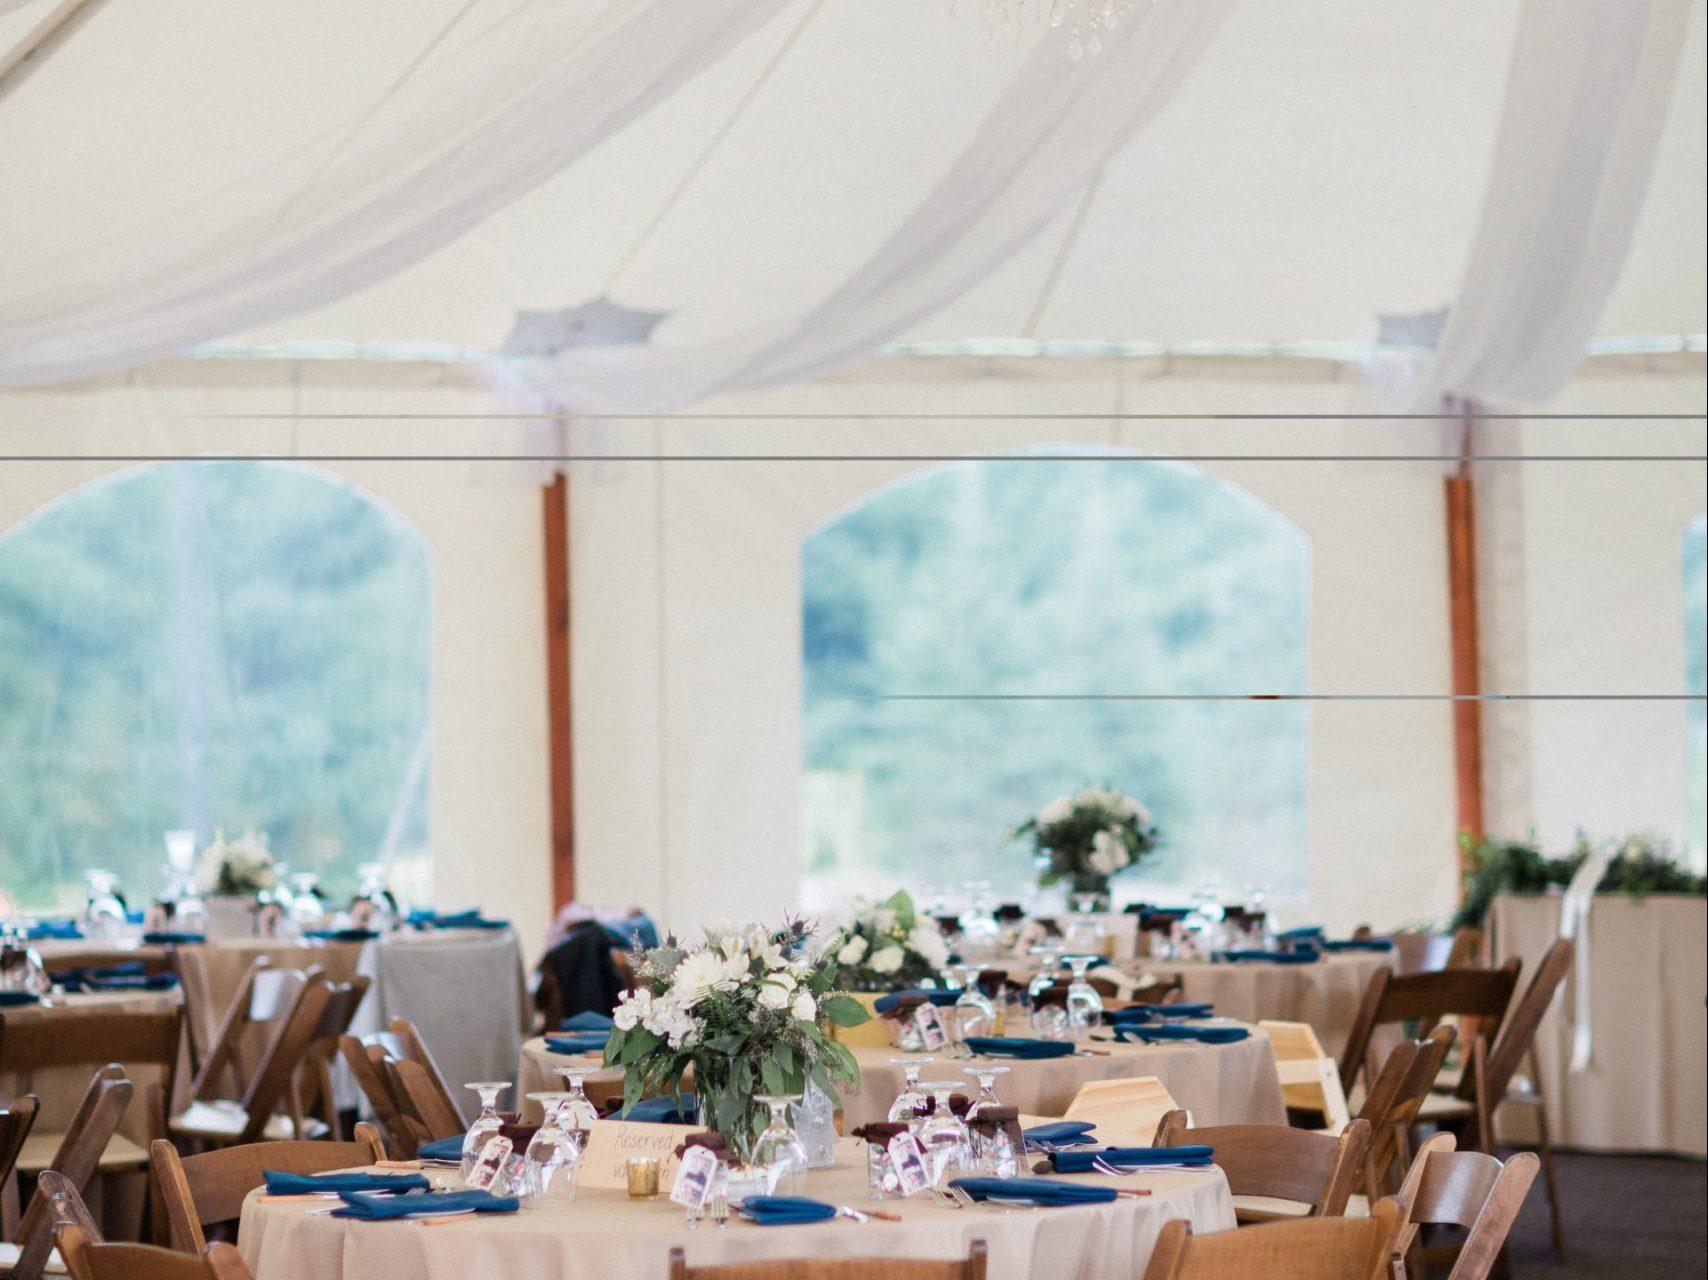 675 Tate.Wedding.18 scaled e1588629748855